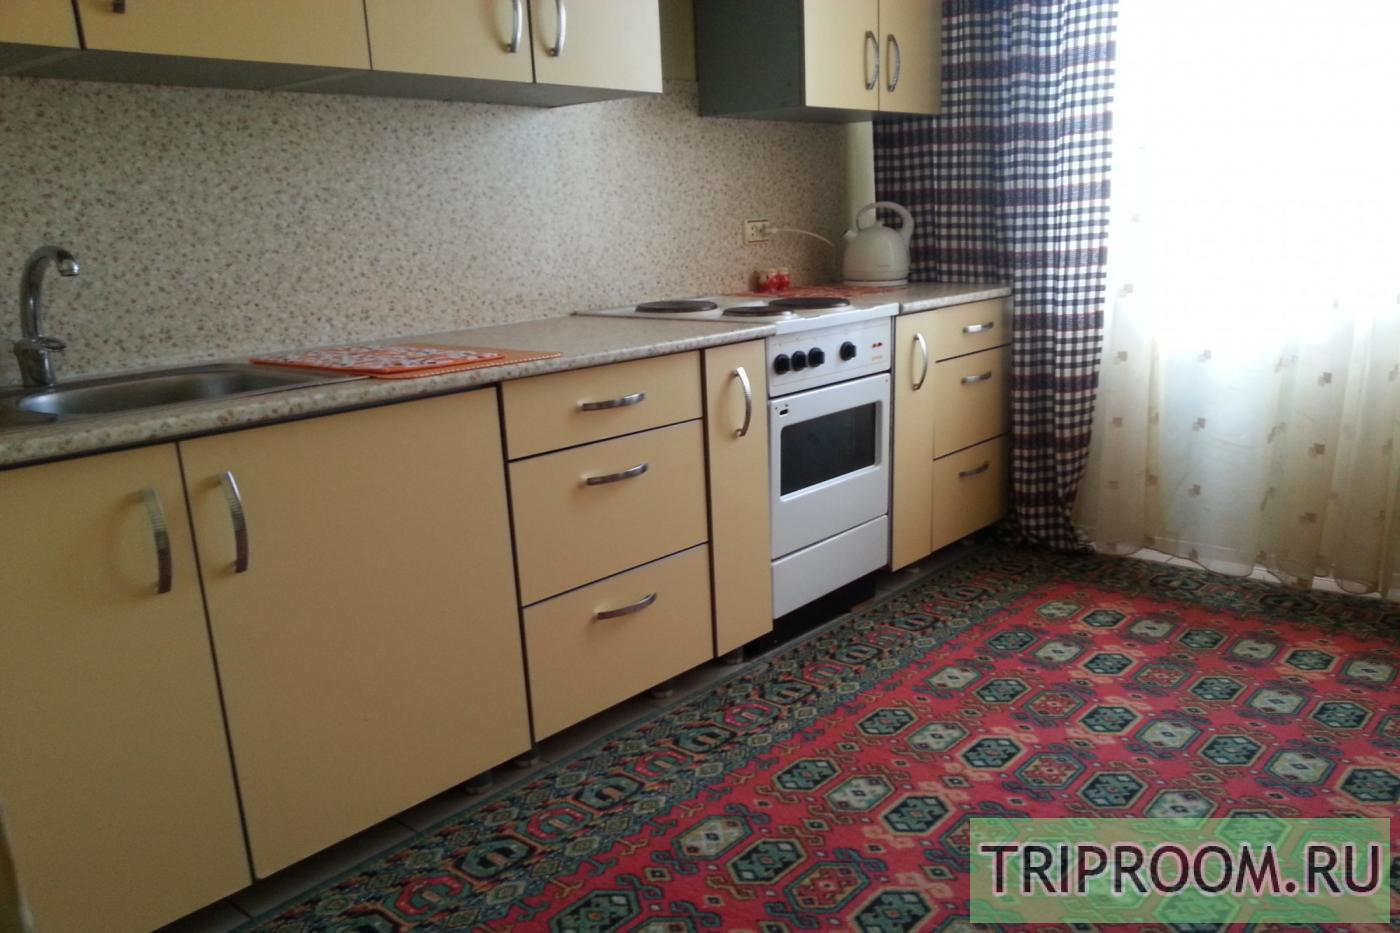 2-комнатная квартира посуточно (вариант № 30833), ул. Франкфурта улица, фото № 9